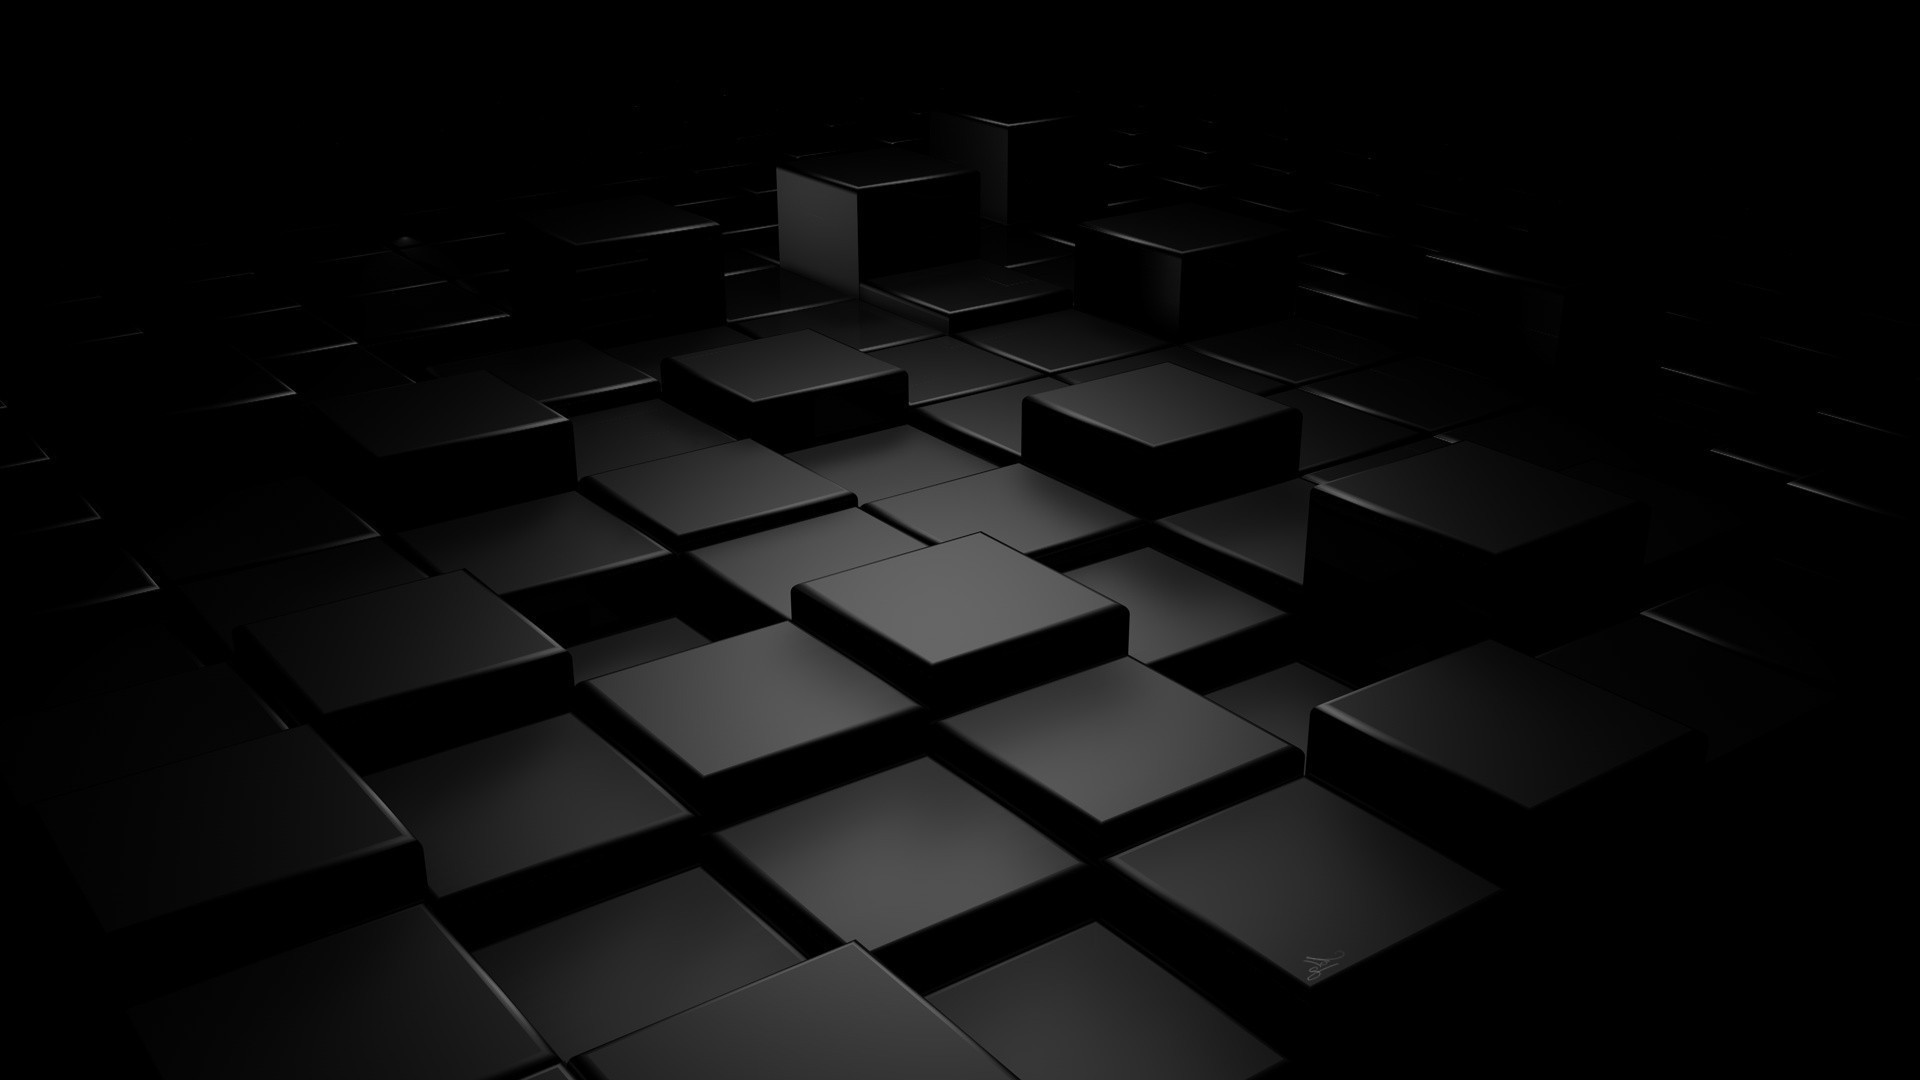 Simple Dark Wallpapers ModaFinilsale